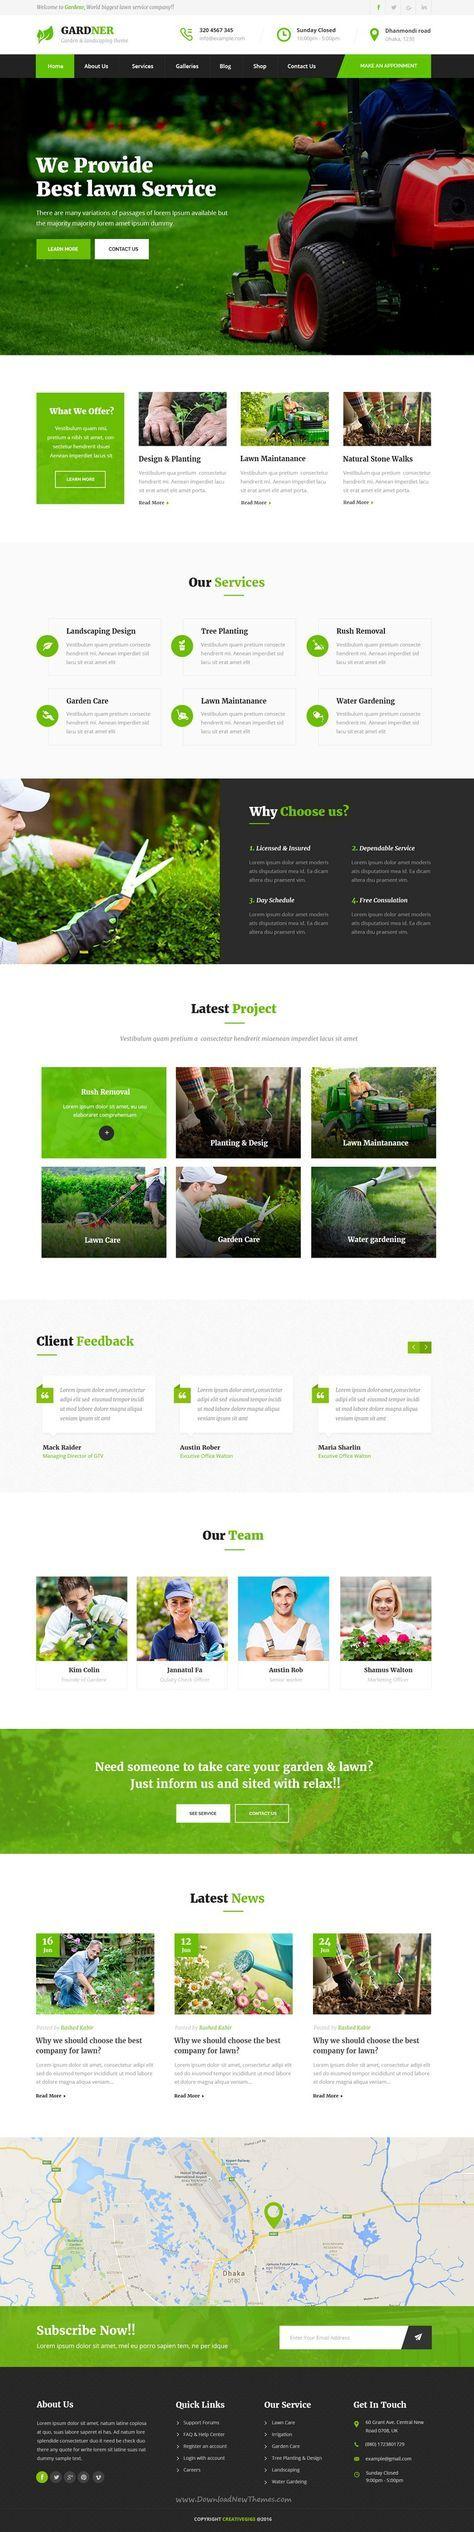 Gardner Garden Landscaping Psd Template Web Layout Design Modern Landscape Design Website Design Inspiration